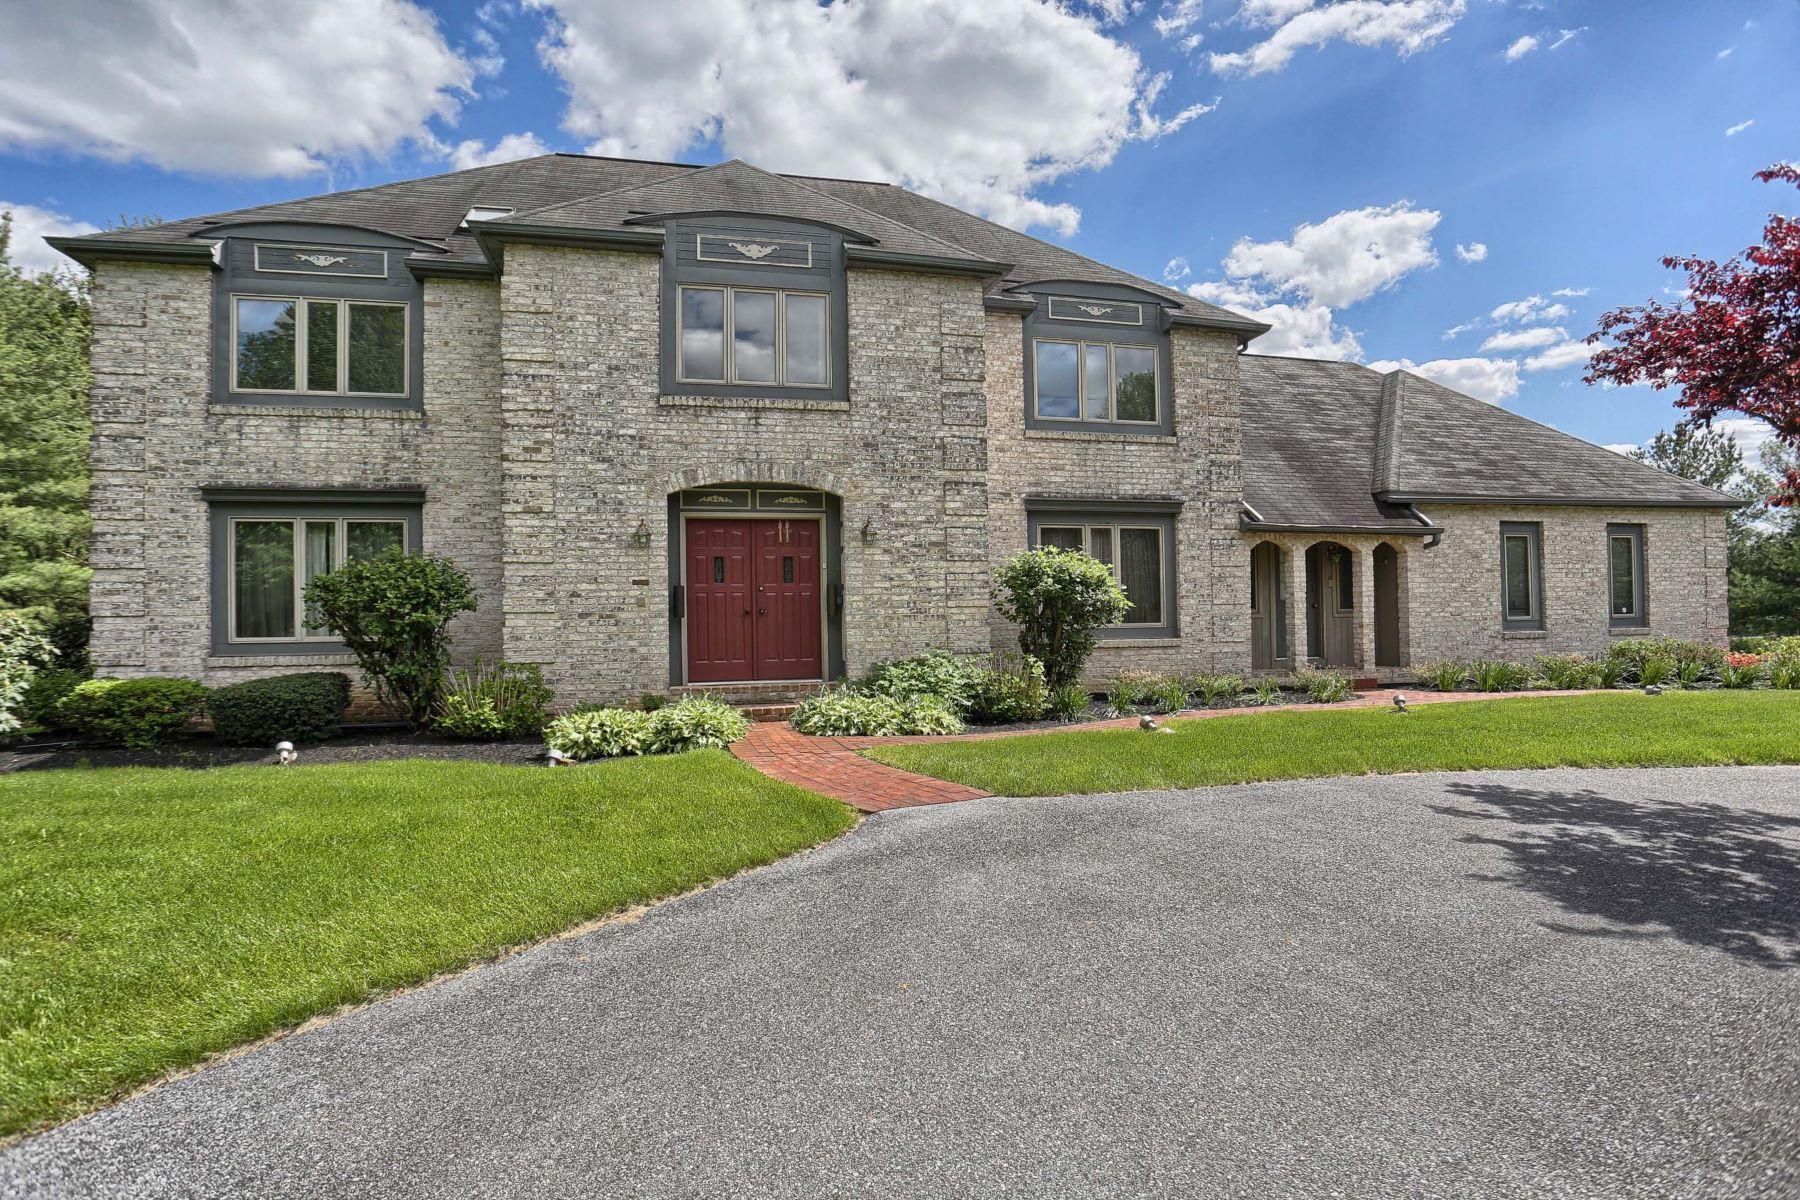 Single Family Home for Sale at 360 Sarsen Drive Lititz, Pennsylvania 17543 United States